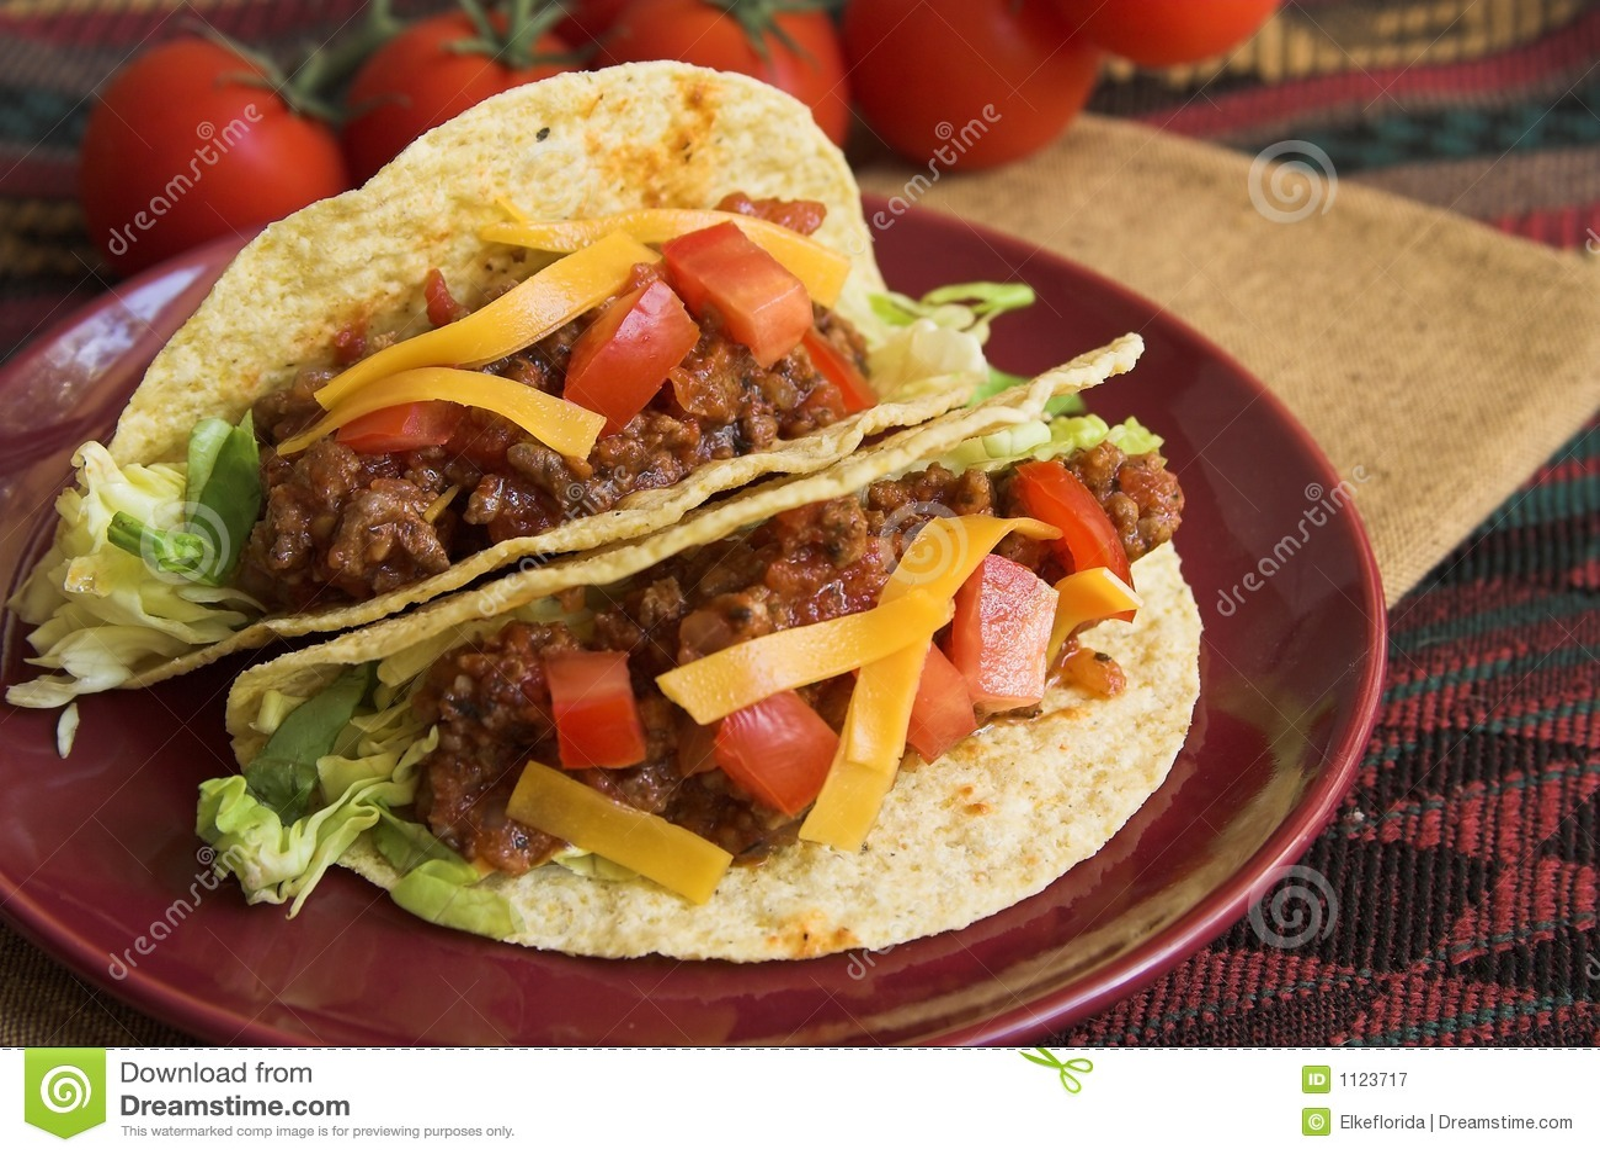 Tacos sera